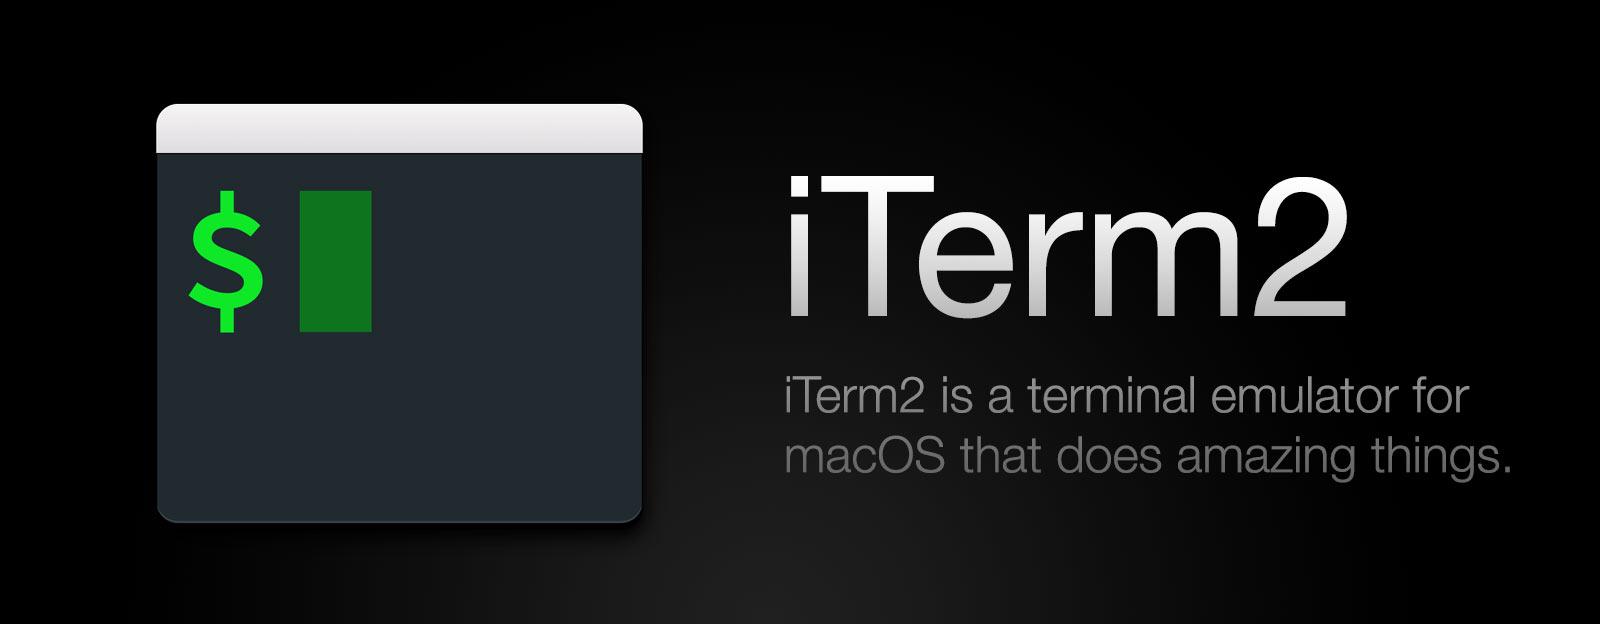 iTerm2 远程连接服务器乱码问题